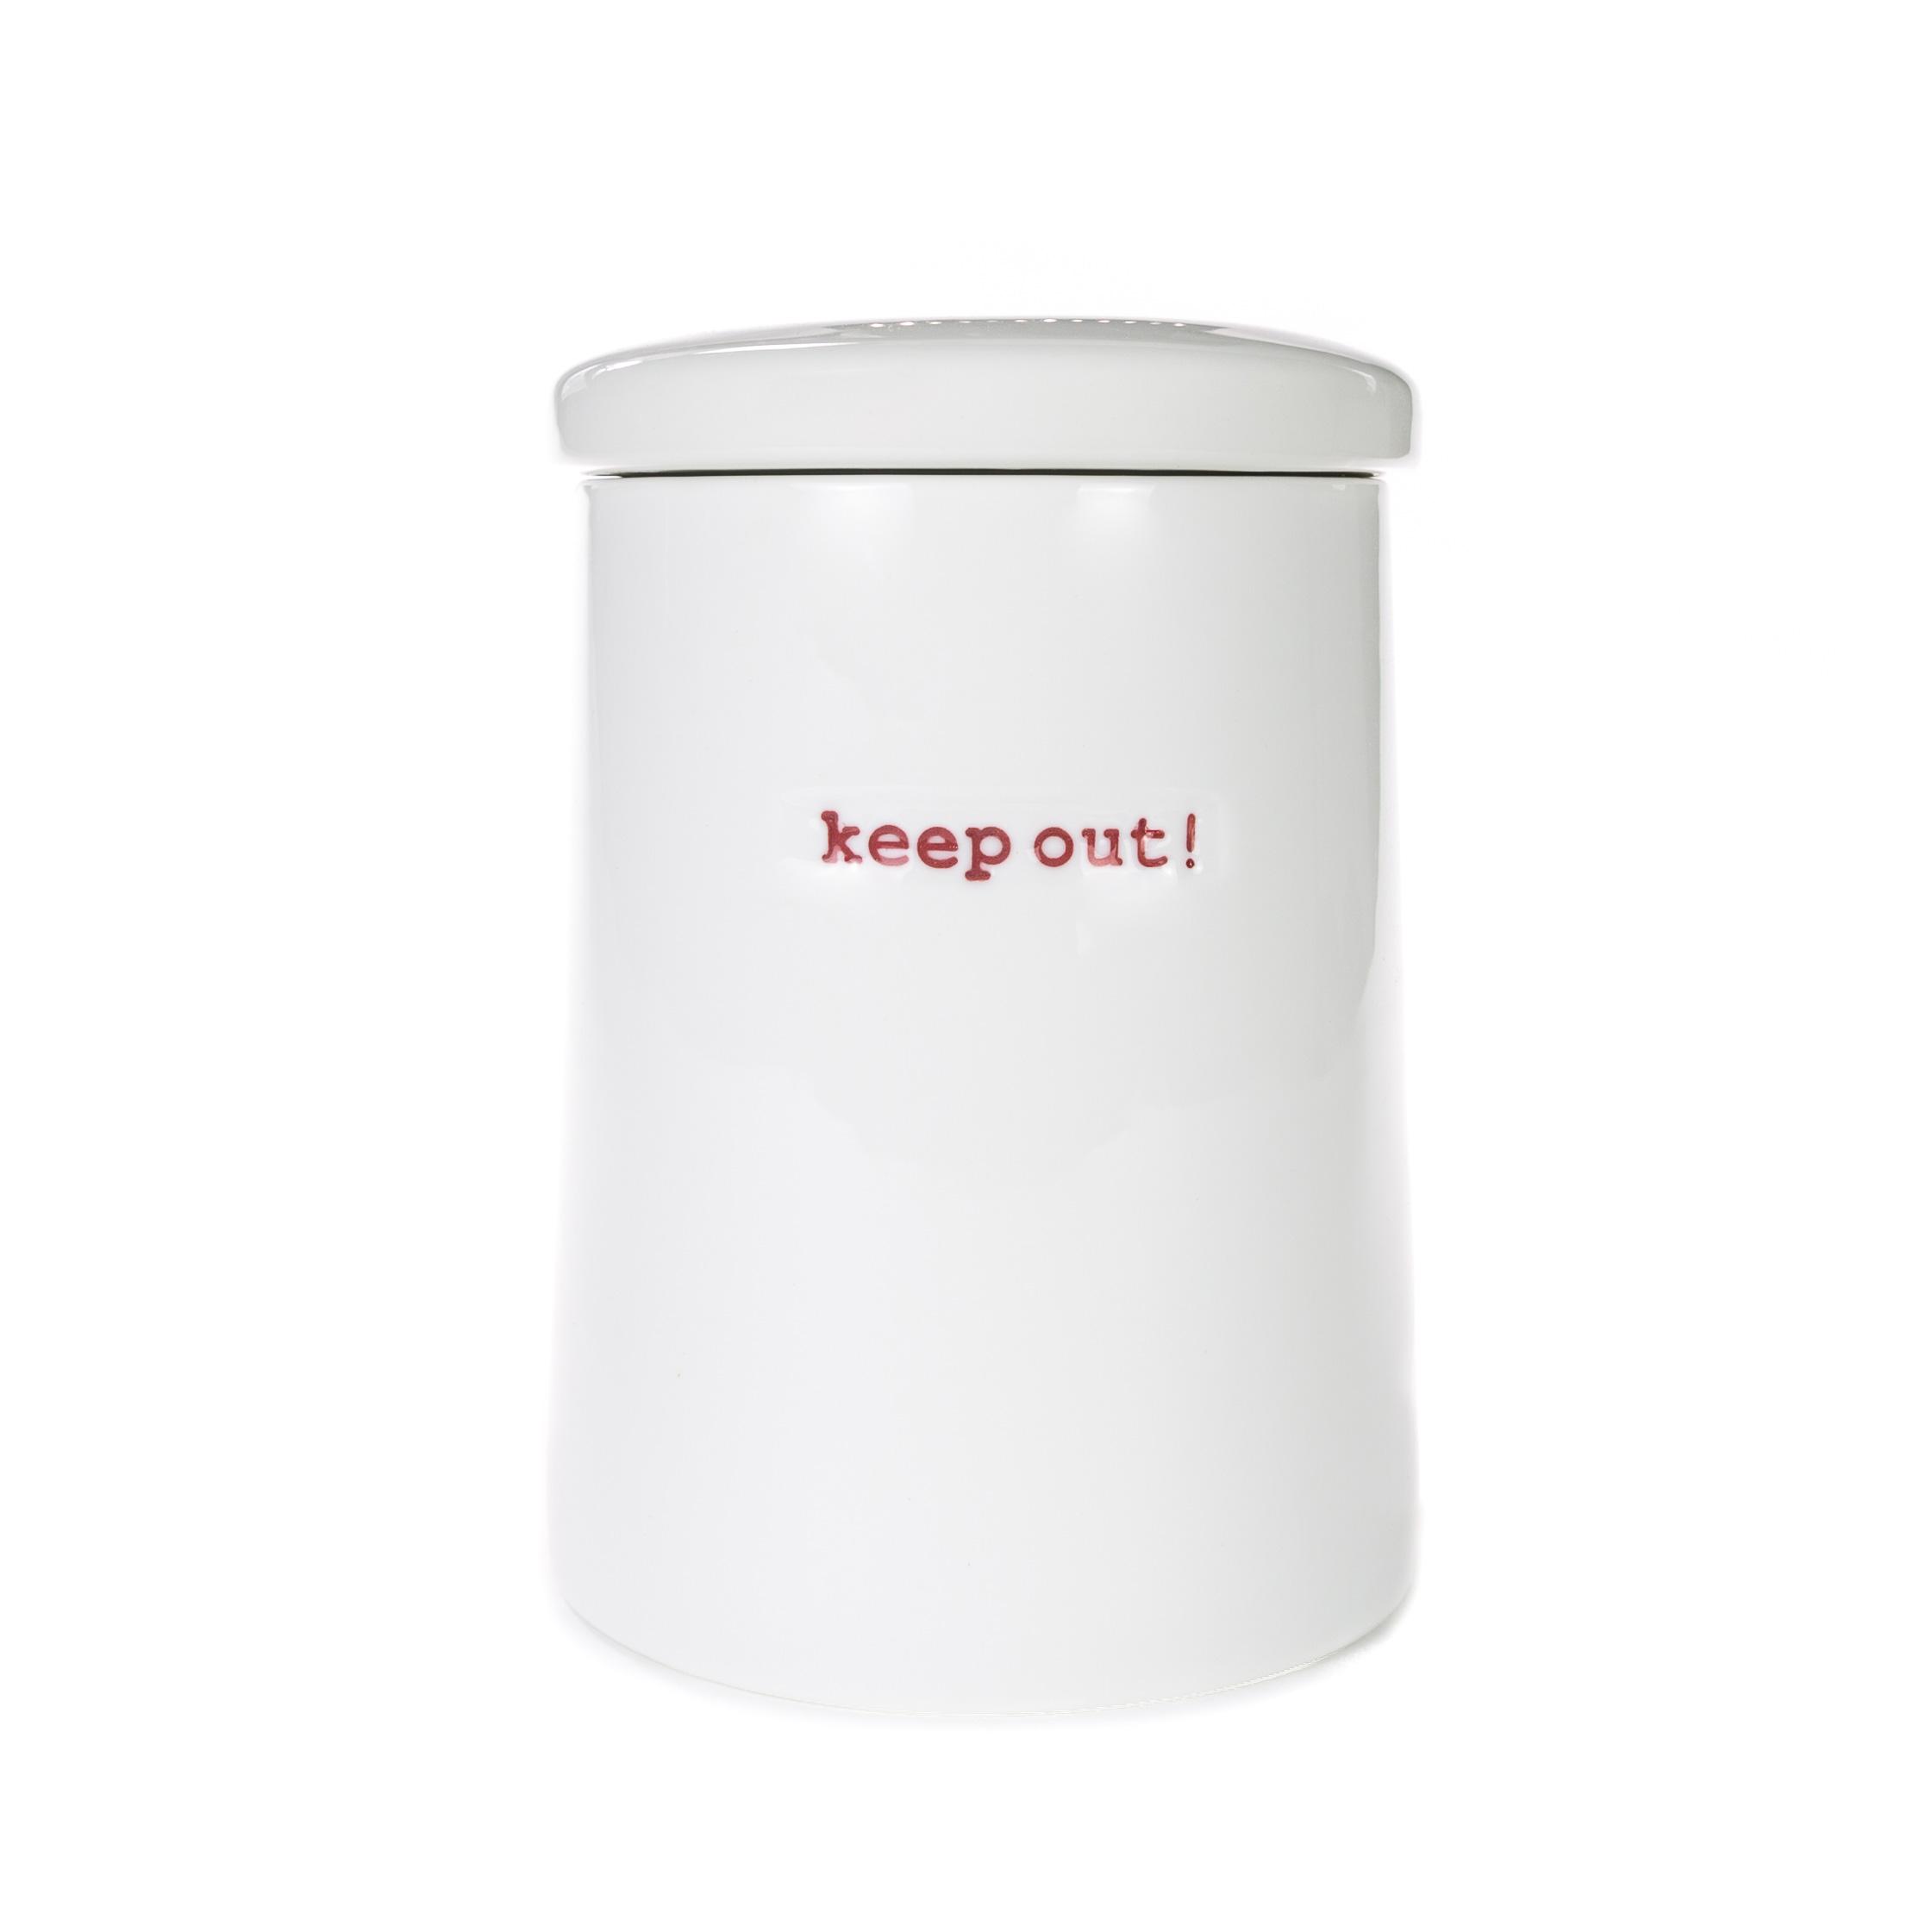 Storage Jar - keep out!